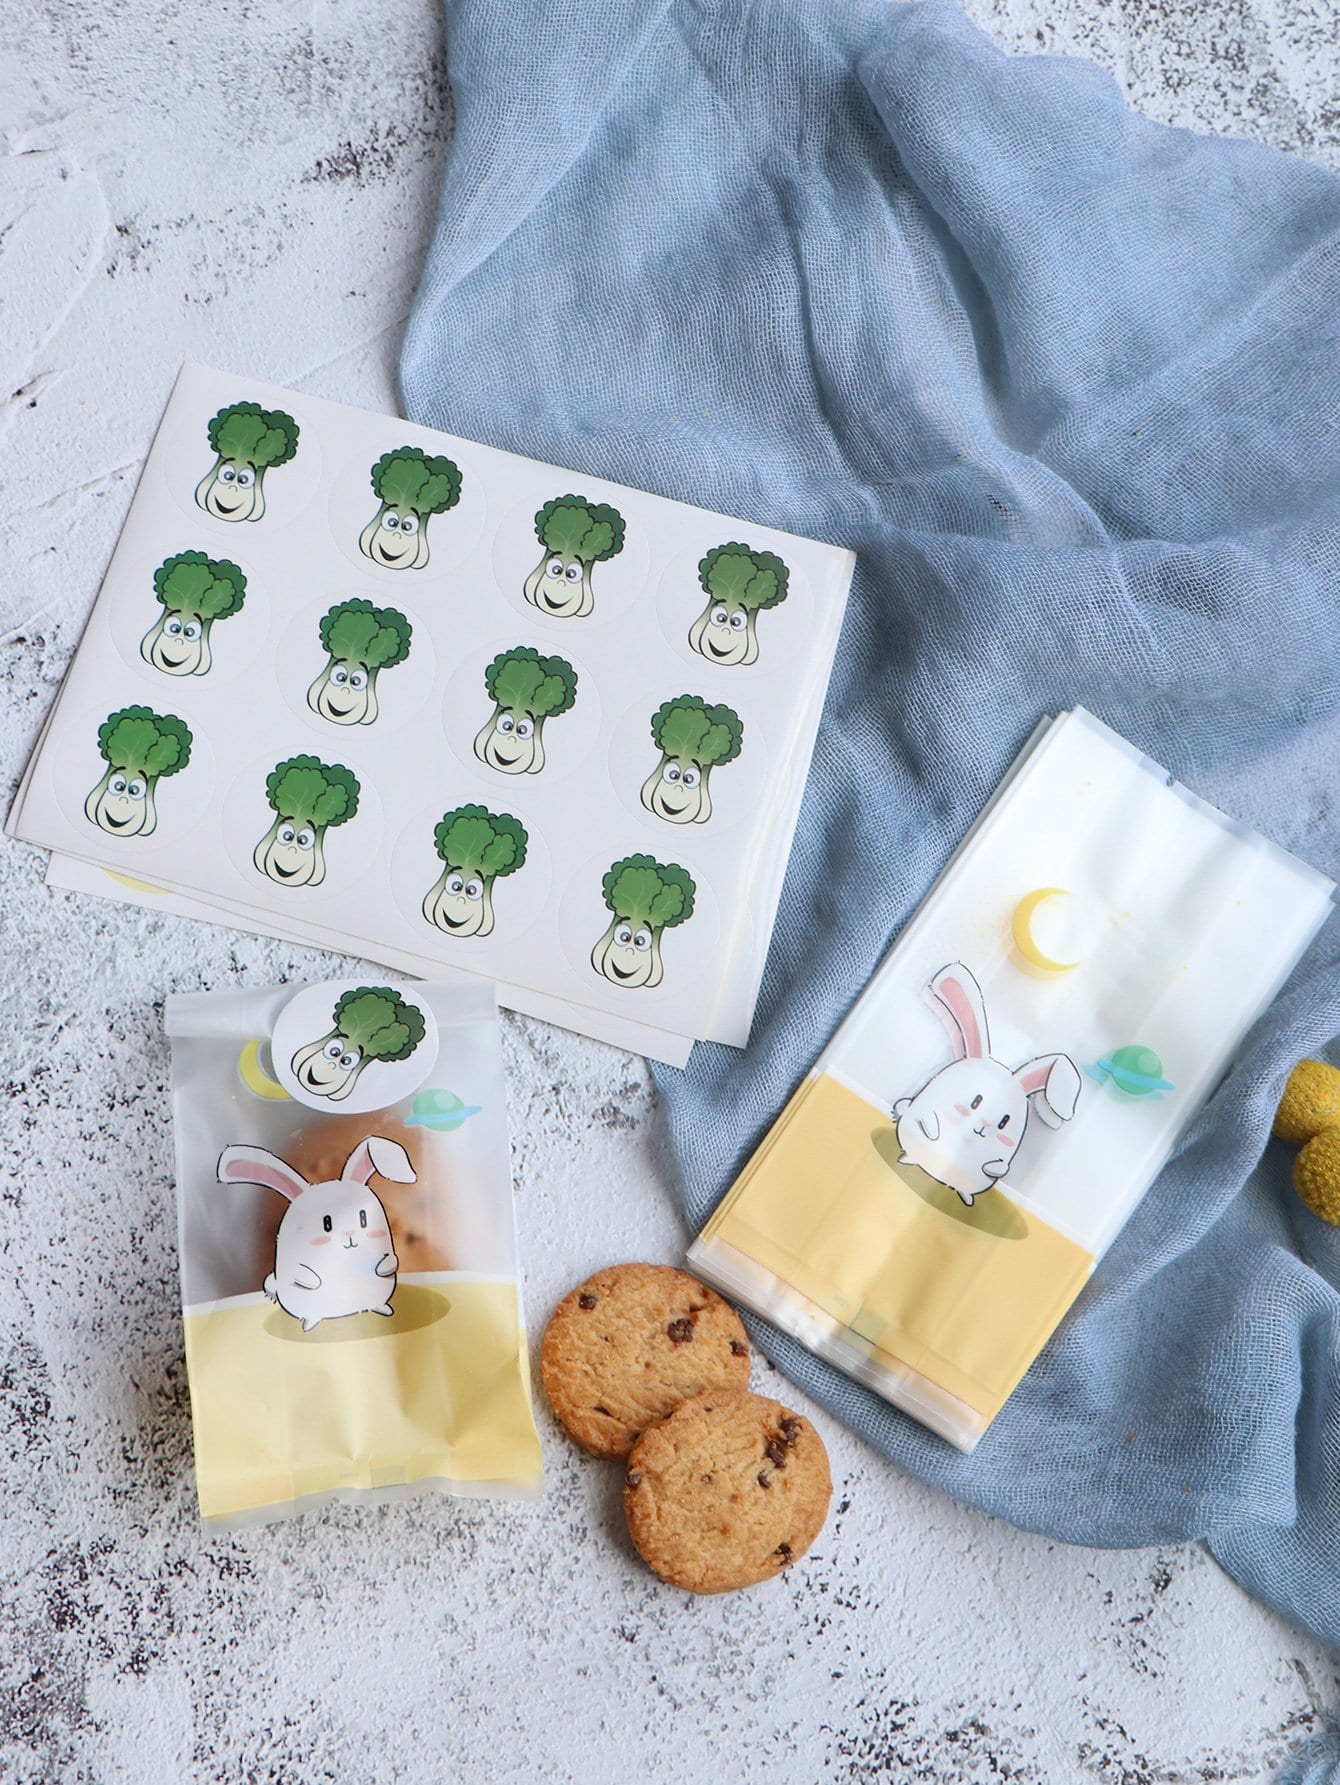 Kaninchen Muster Keks Tasche 50pcs mit Aufkleber 5pcs